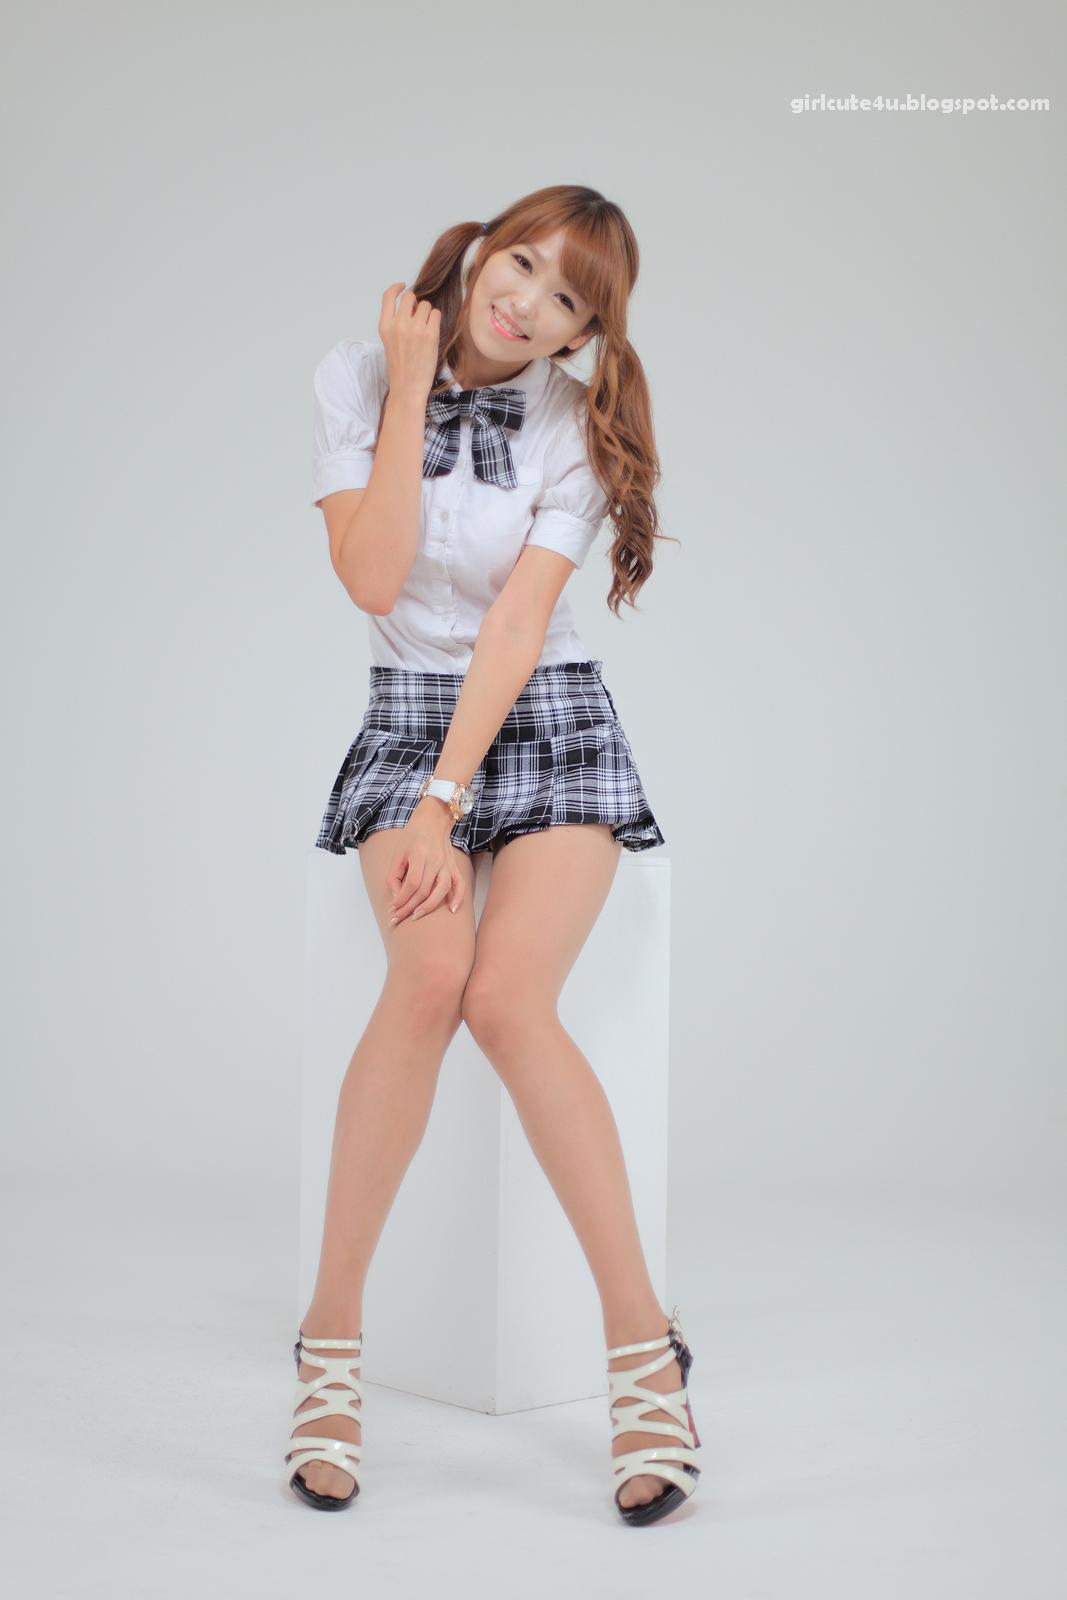 school girls - Bing